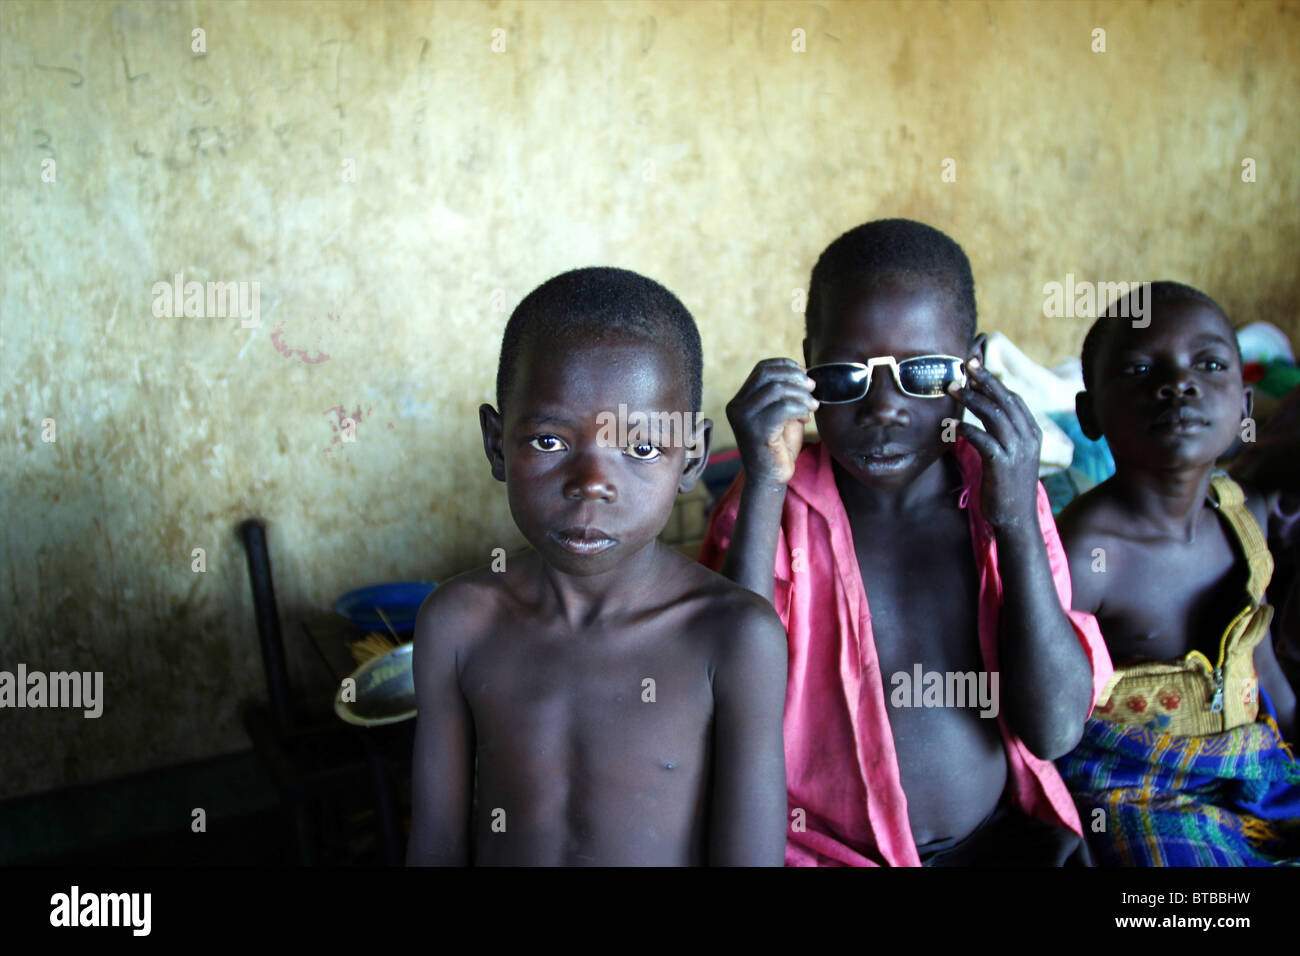 displaced people in Uganda - Stock Image